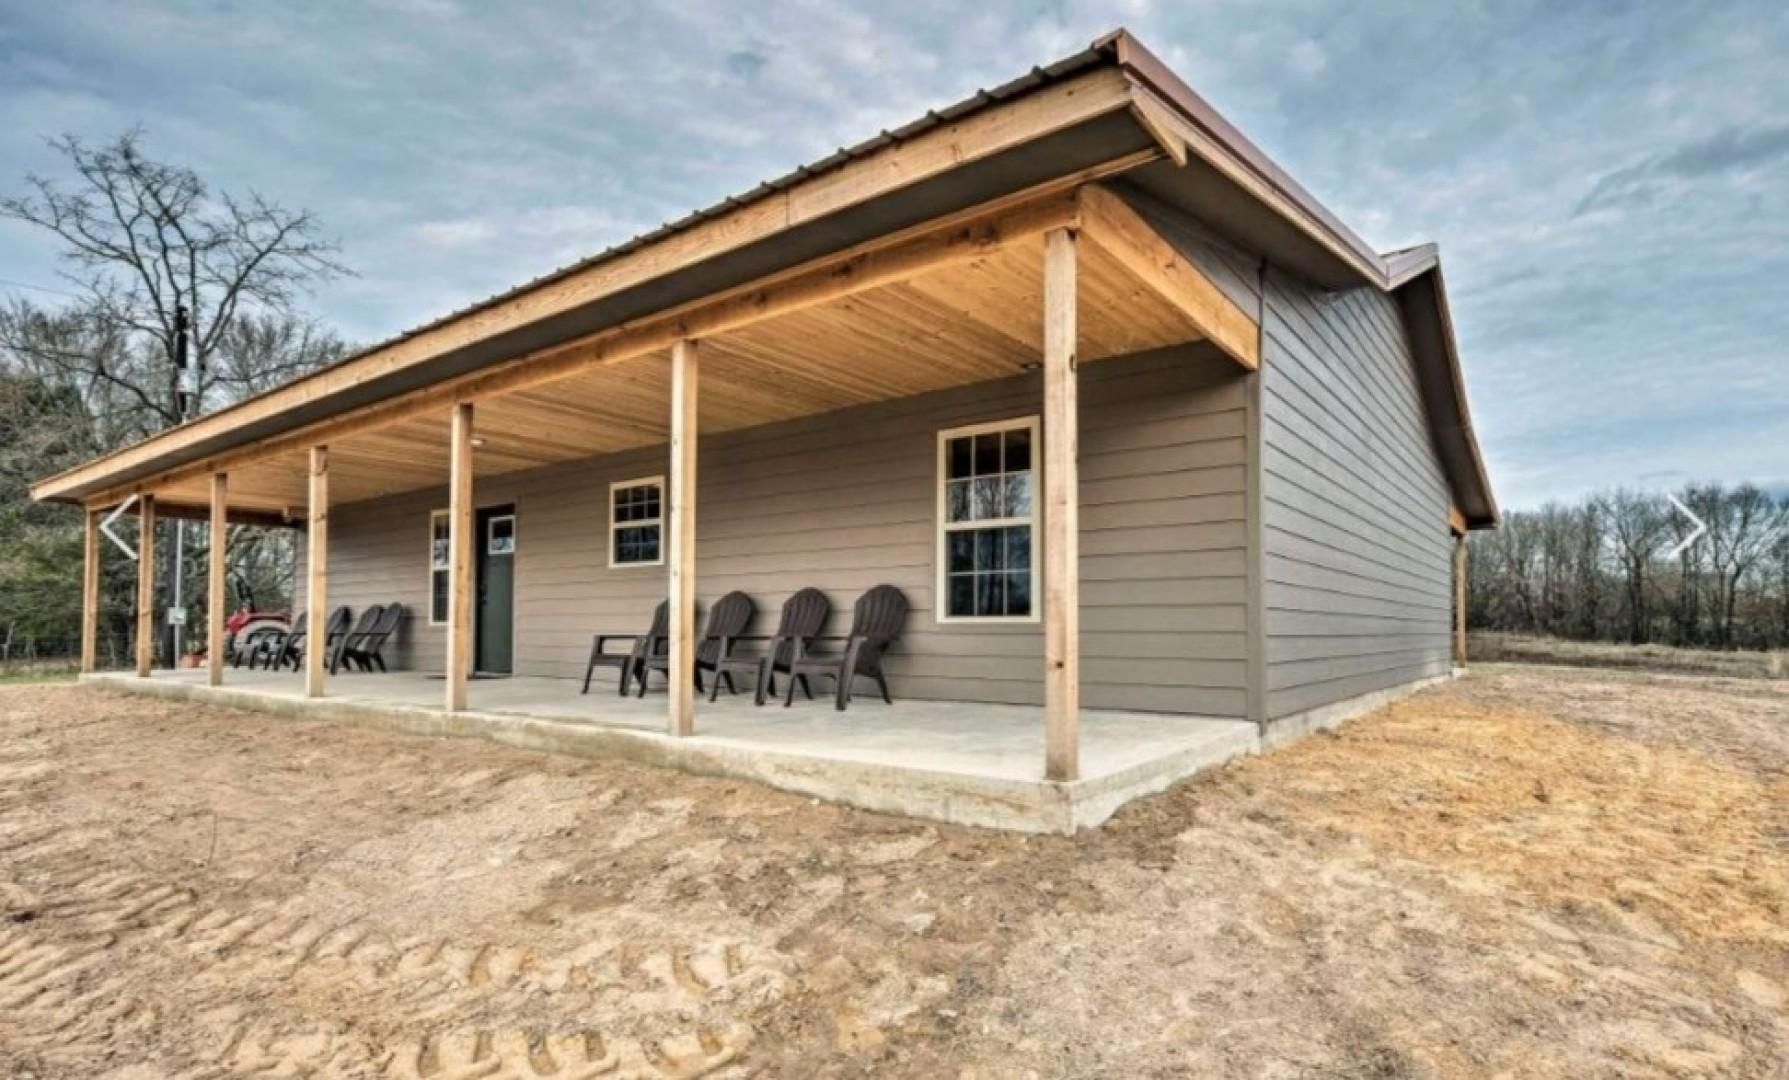 Little House on the Prairie (Mountain Fork River - Eagletown, OK)